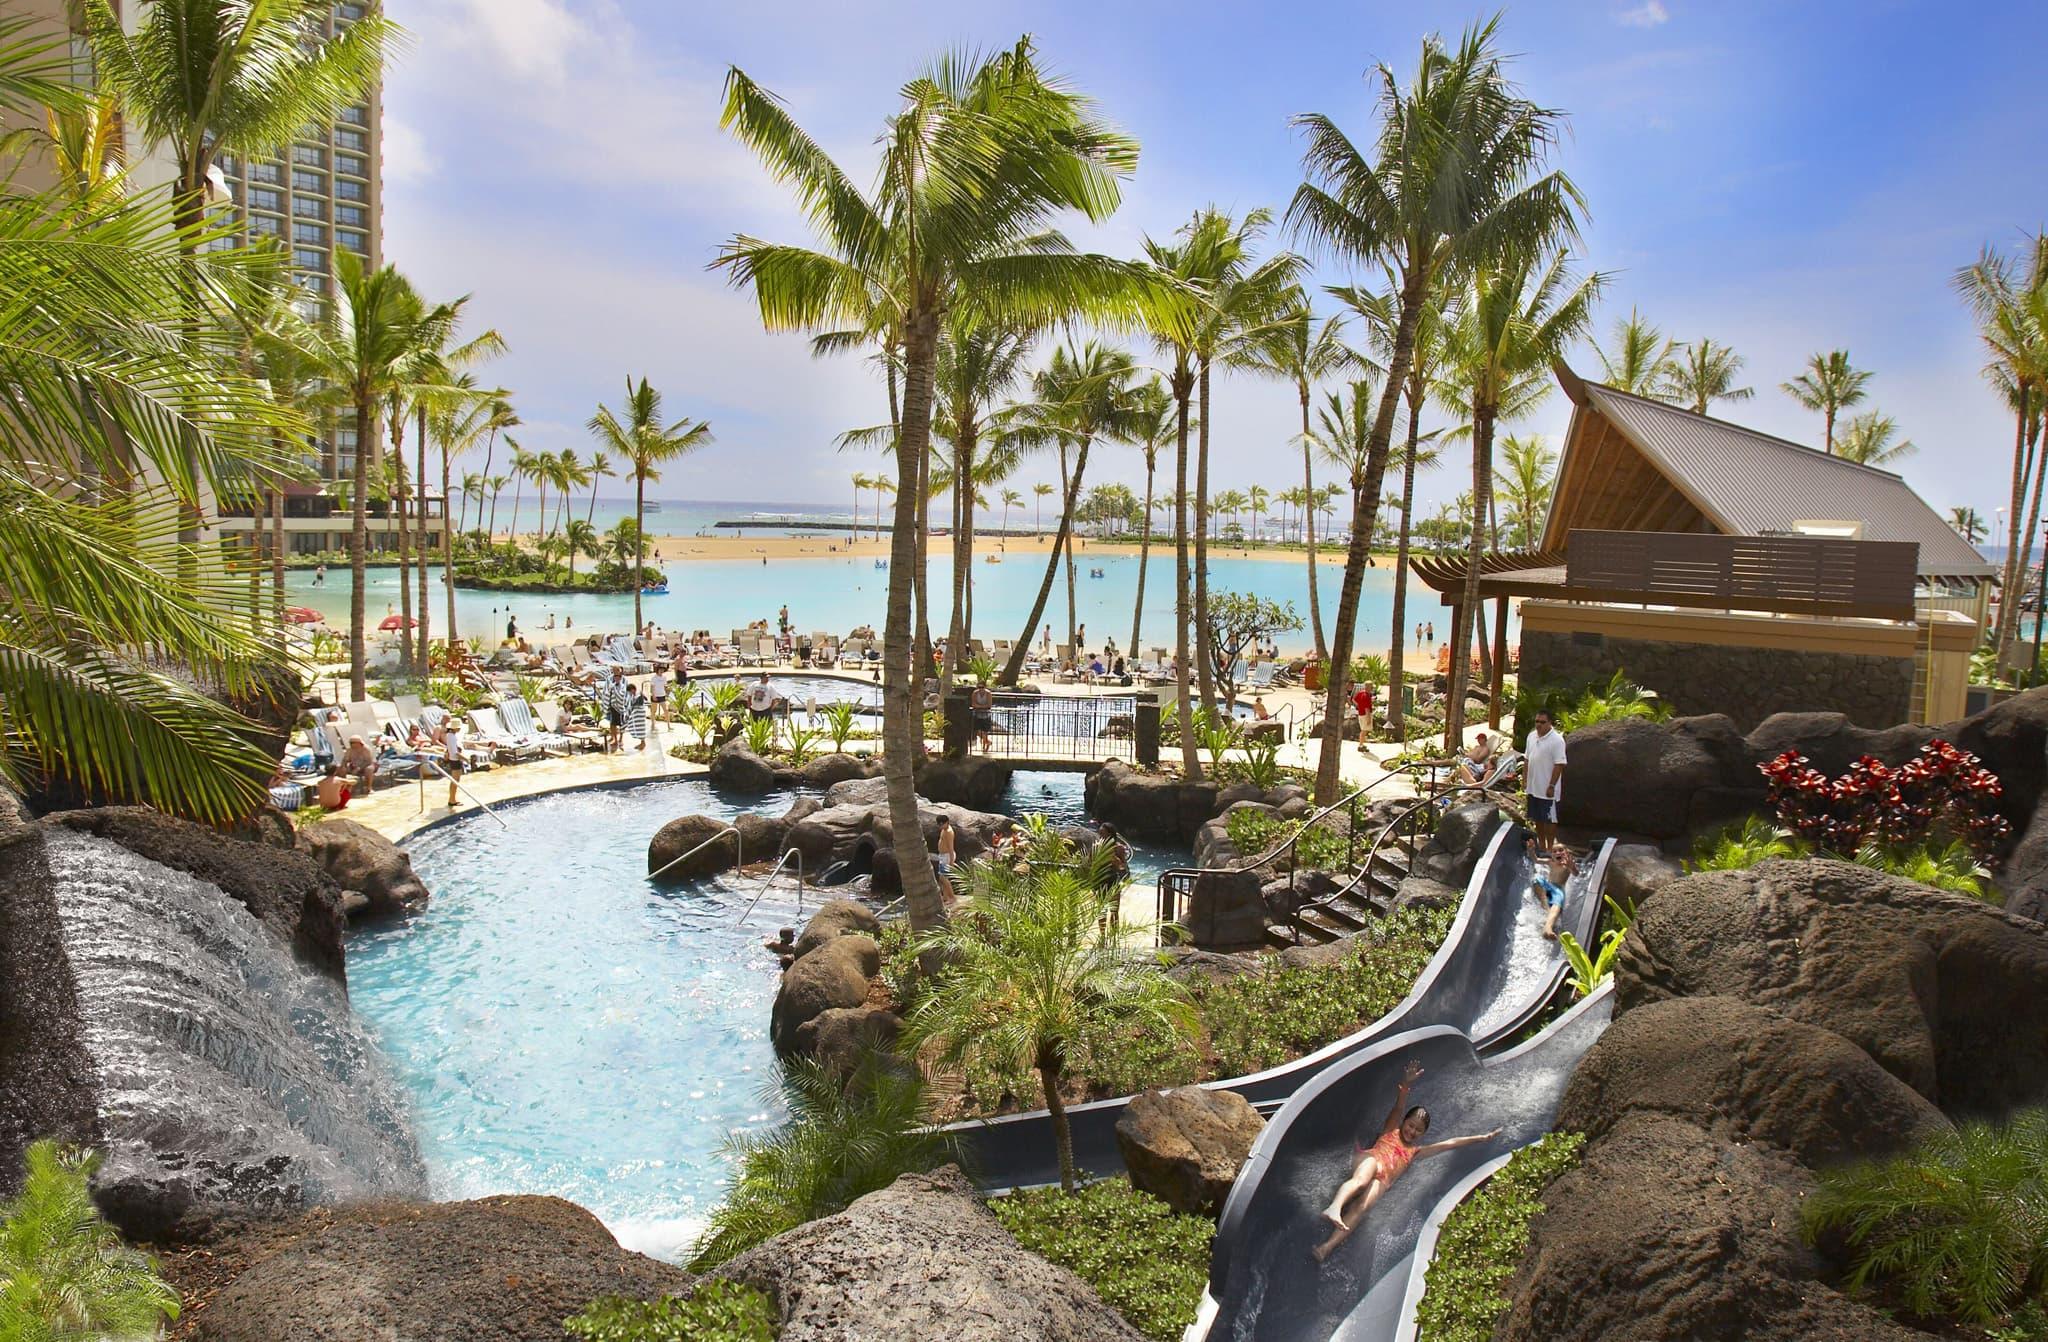 http://www.lexusoflondongolfclassic.com/wp-content/uploads/2015/03/Paradise_Pool.jpg